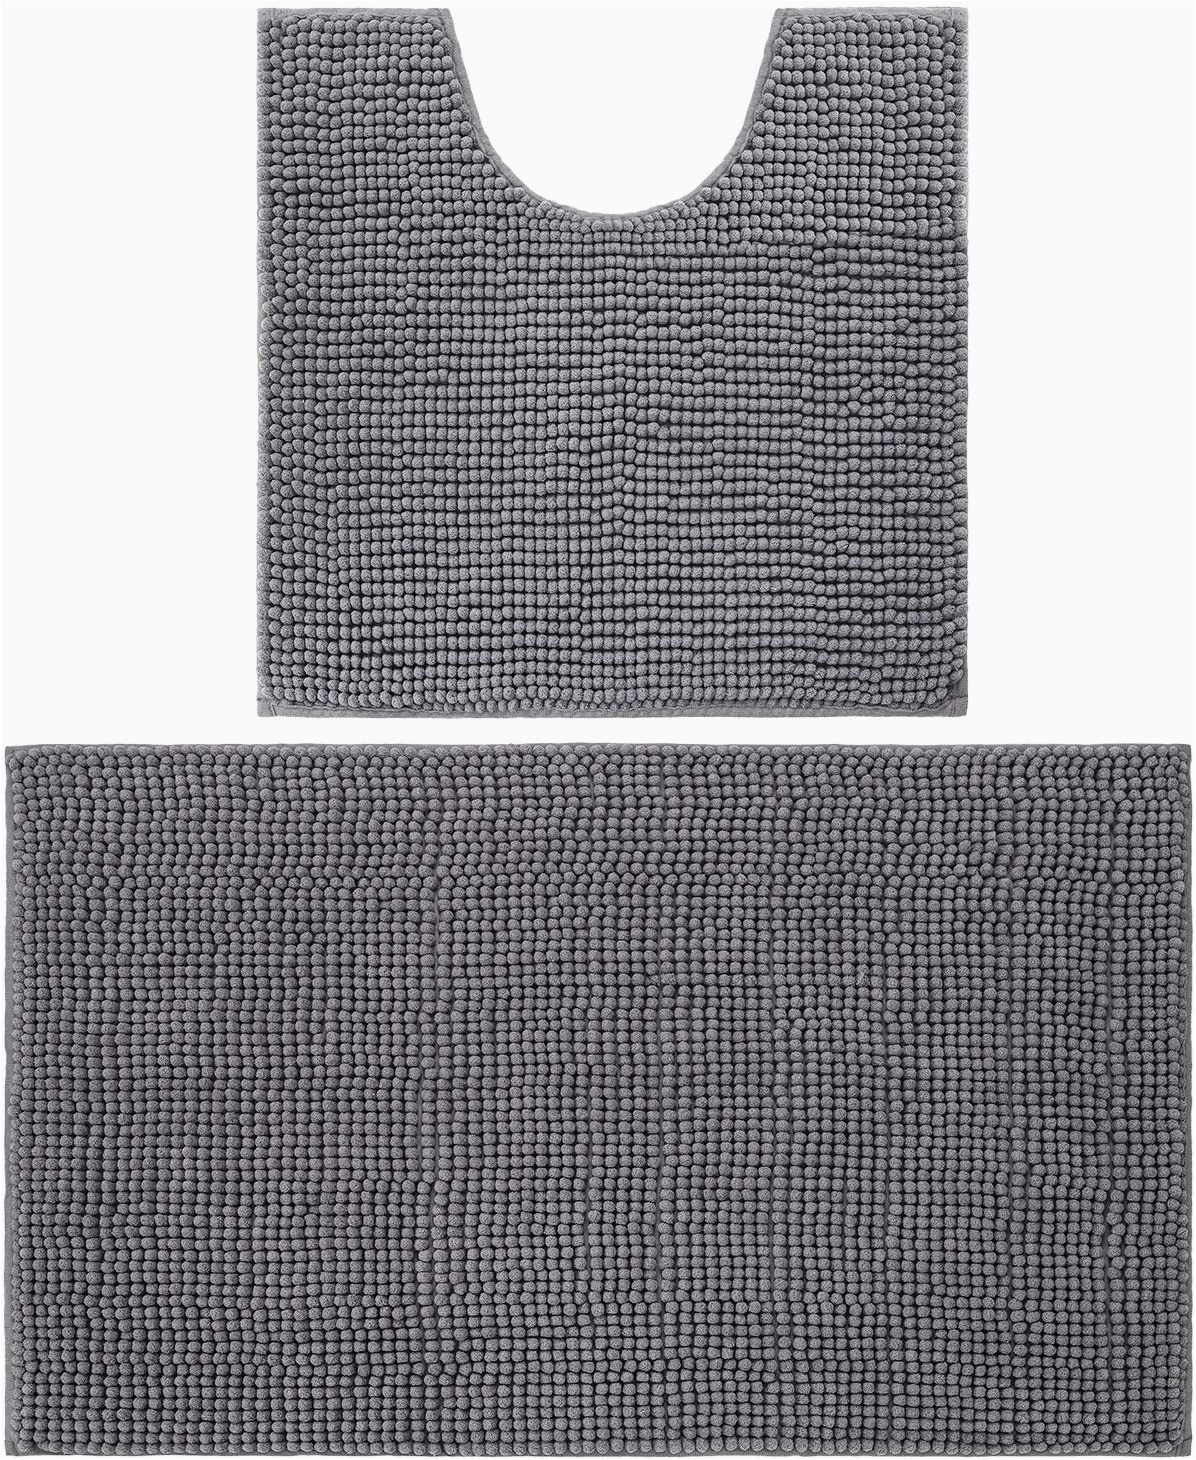 lochas shaggy chenille bathroom rug set 2piece plush bath rugs mats water absorbent carpet non slip contour toilet mat machine washable 32 x 2020x 20 grey ar